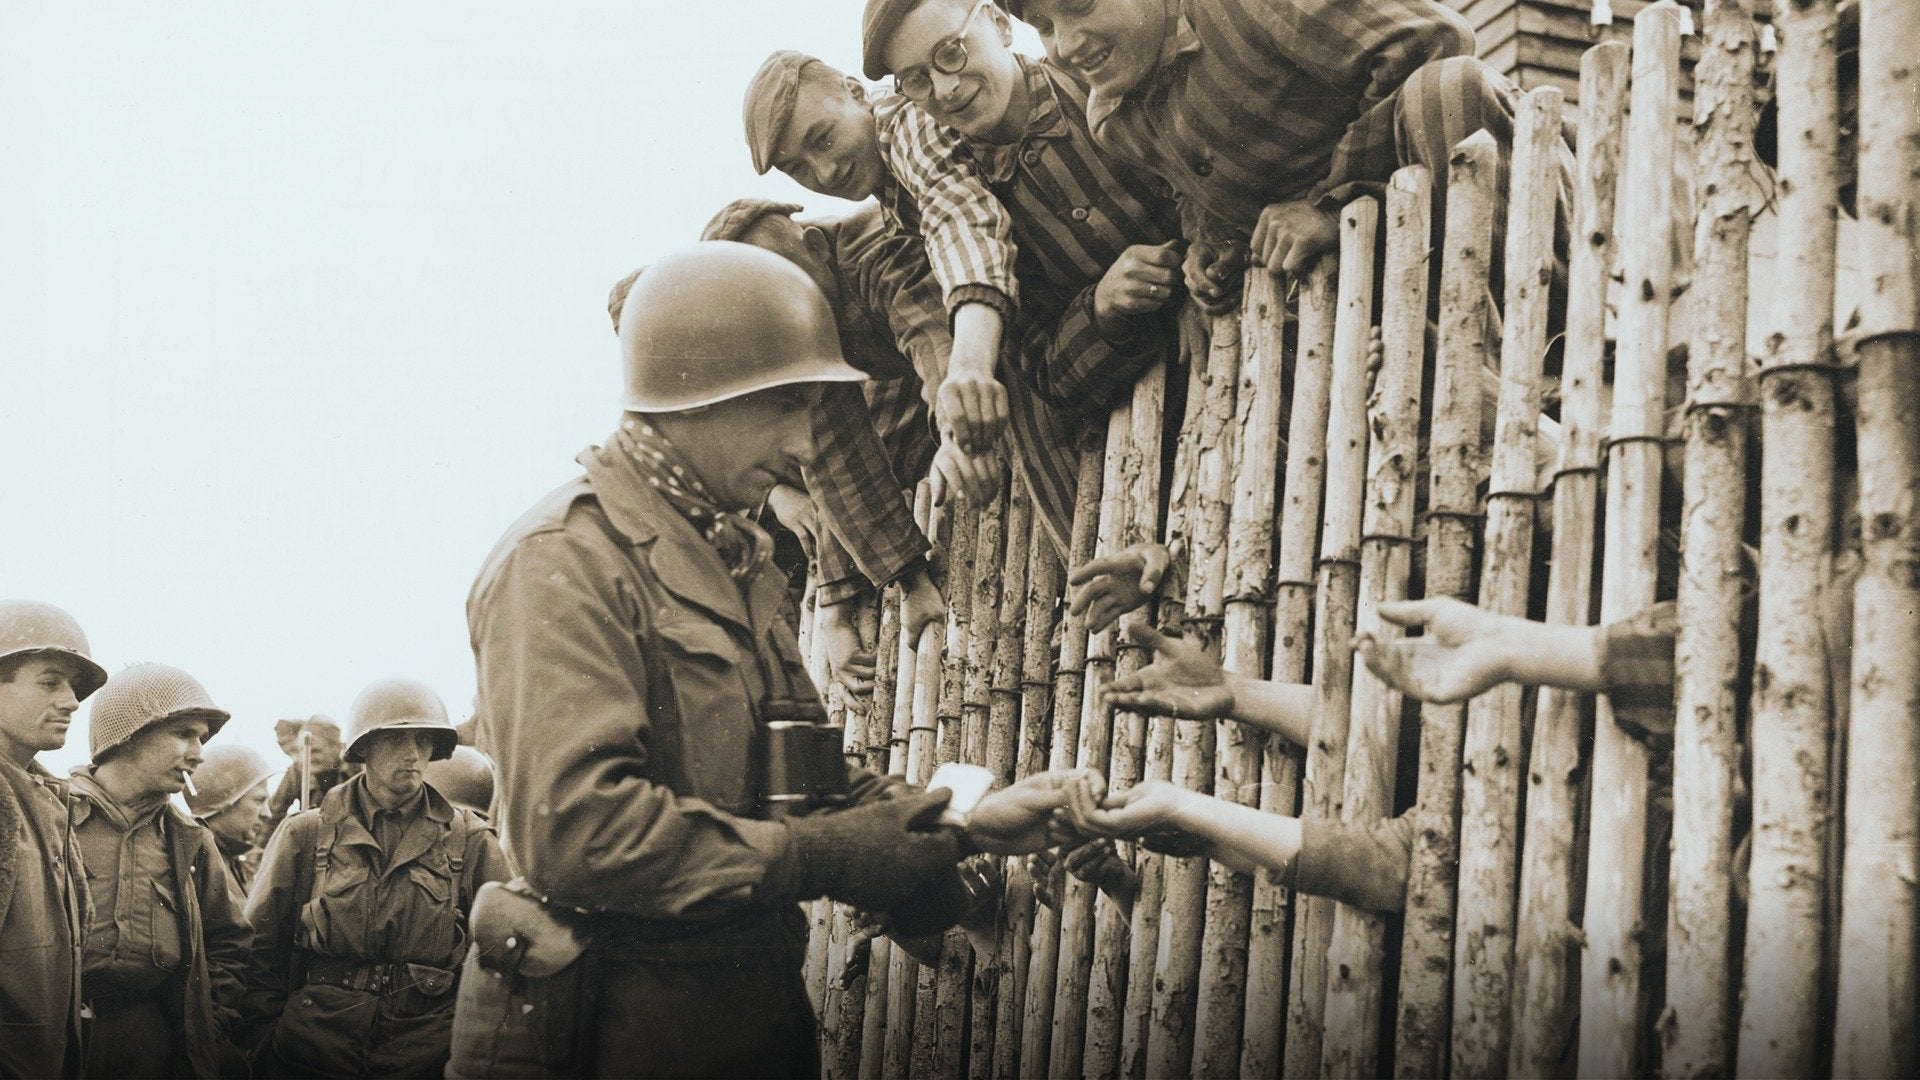 Liberation Heroes: The Last Eyewitnesses